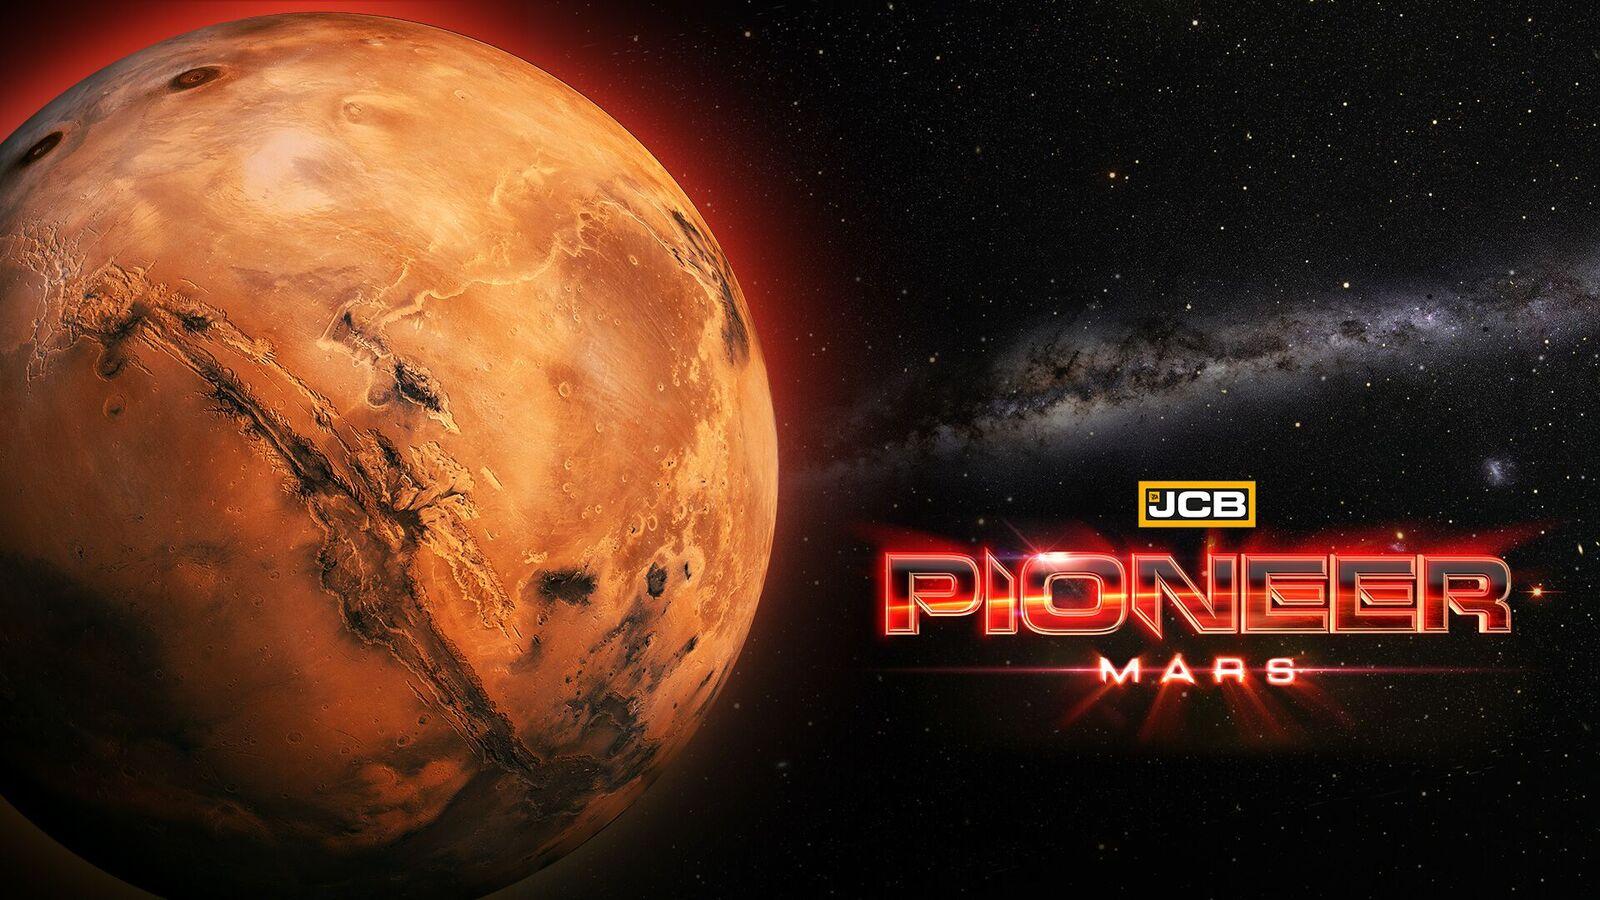 Photo of gamescom 2017: JCB Pioneer: Mars